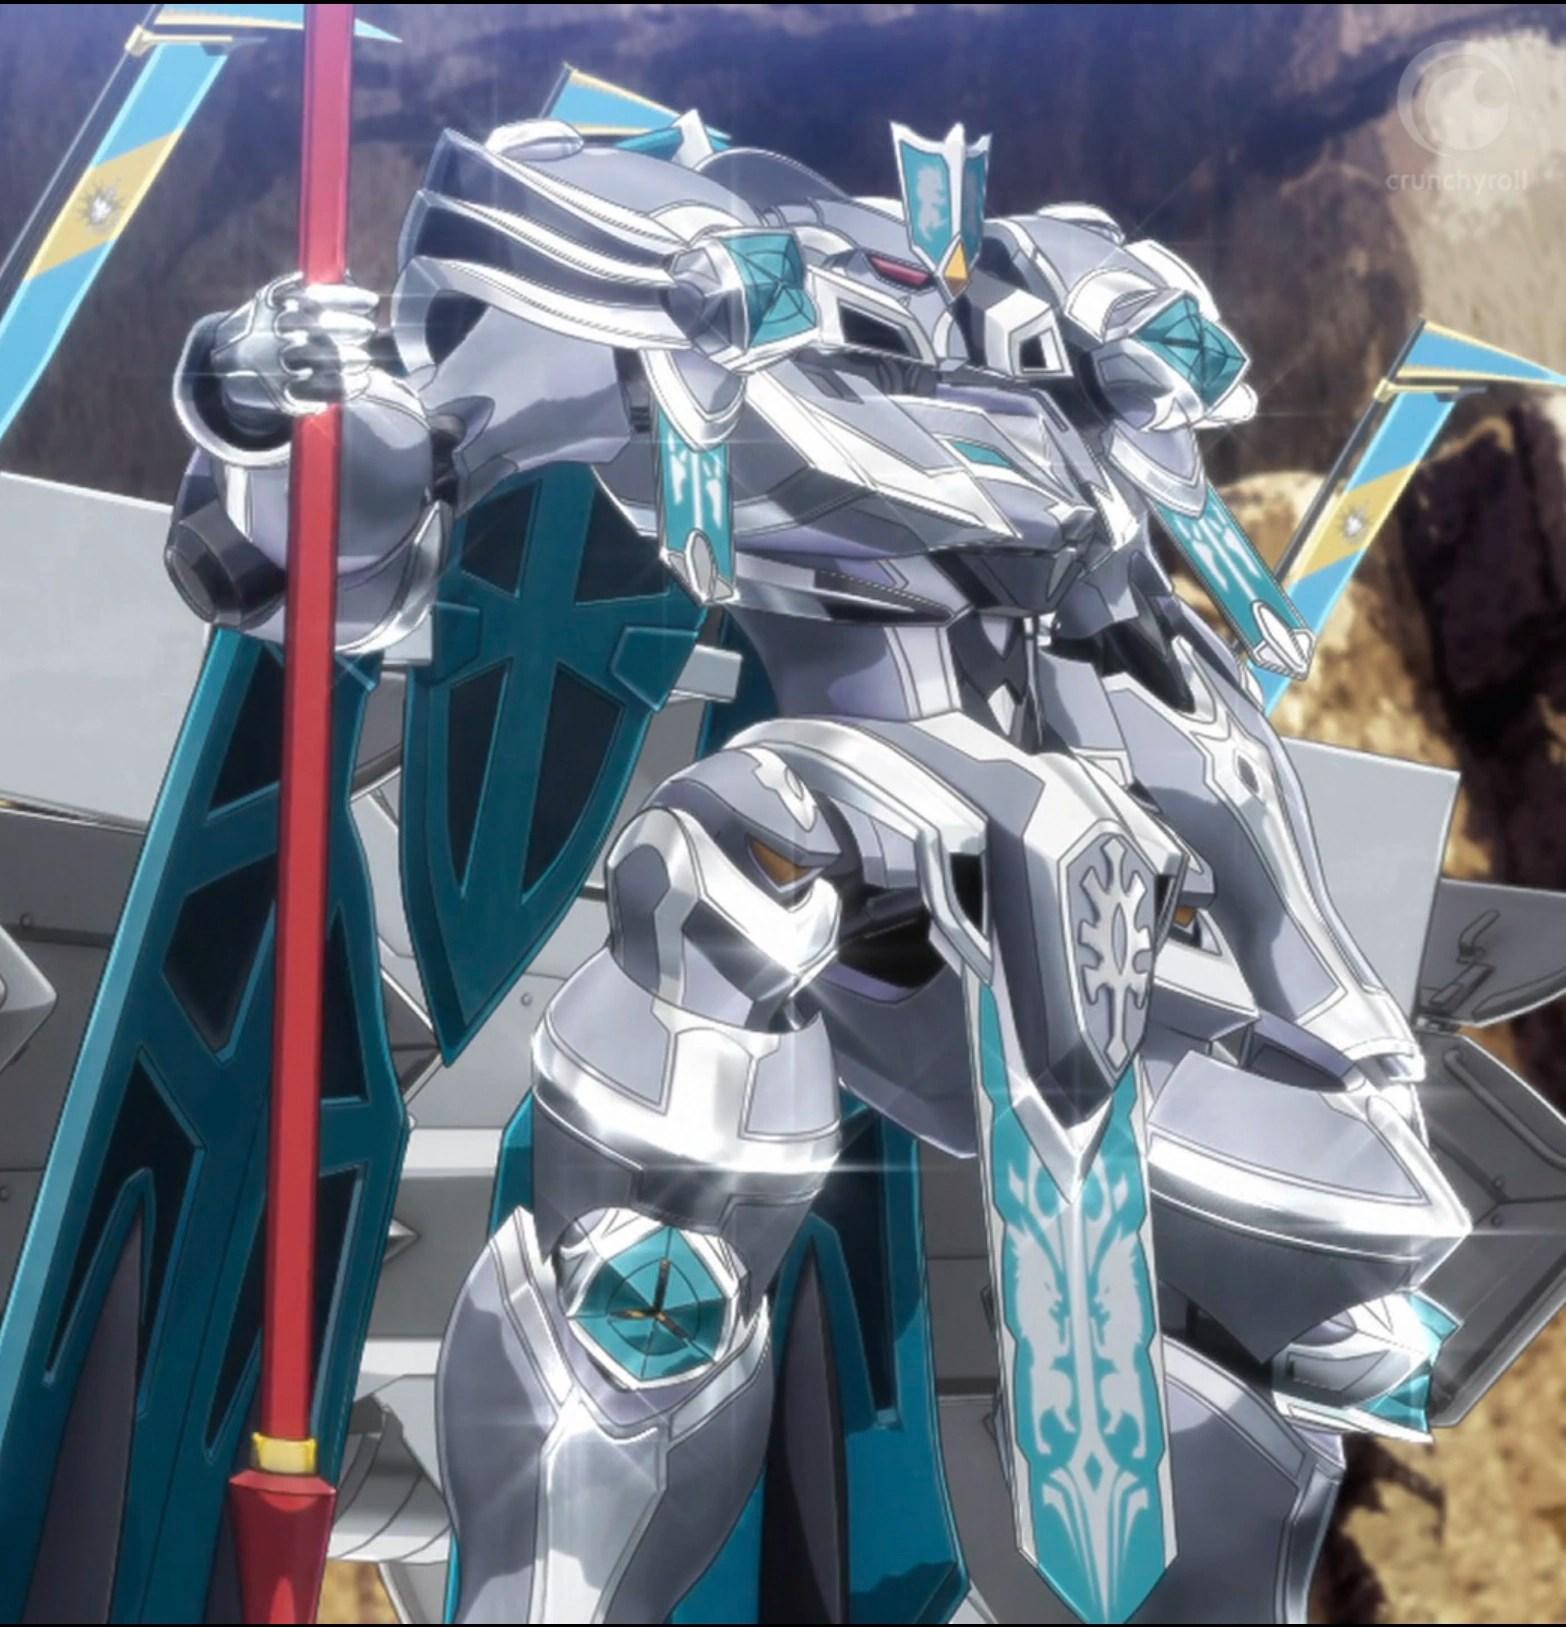 gilbatiga anime knight s